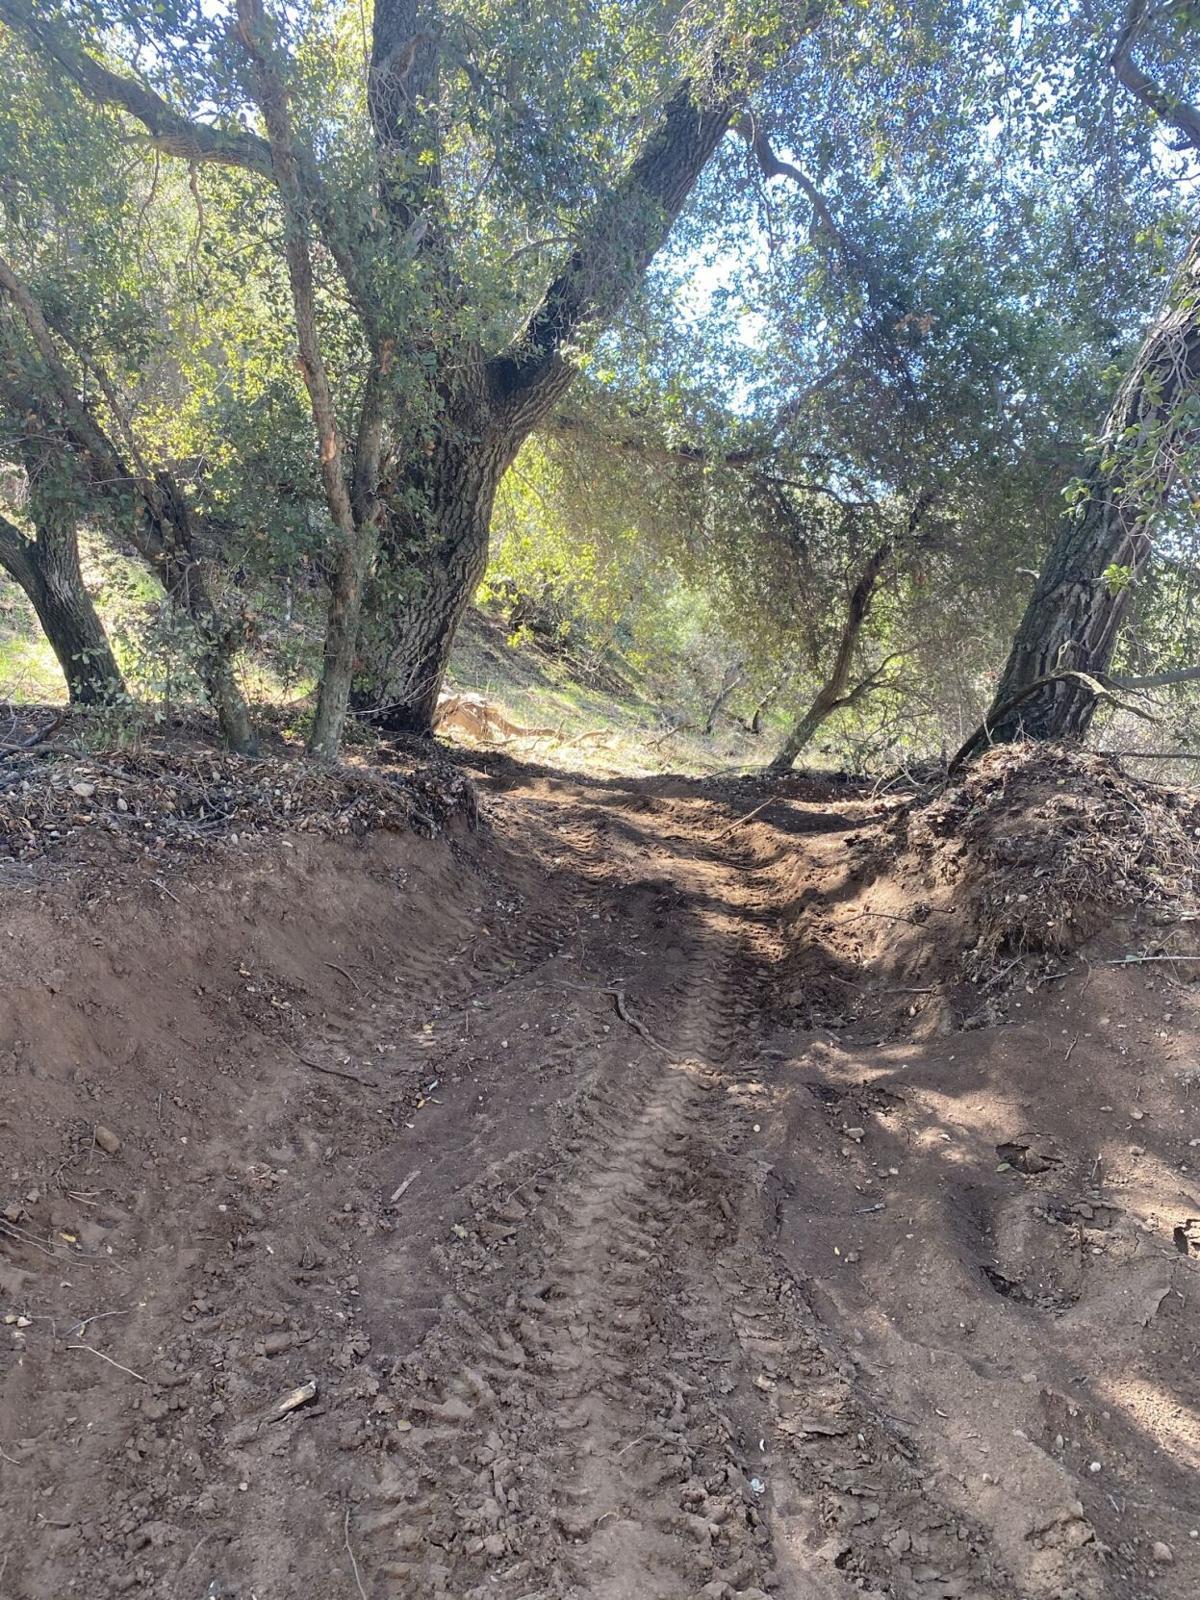 New mountain bike course